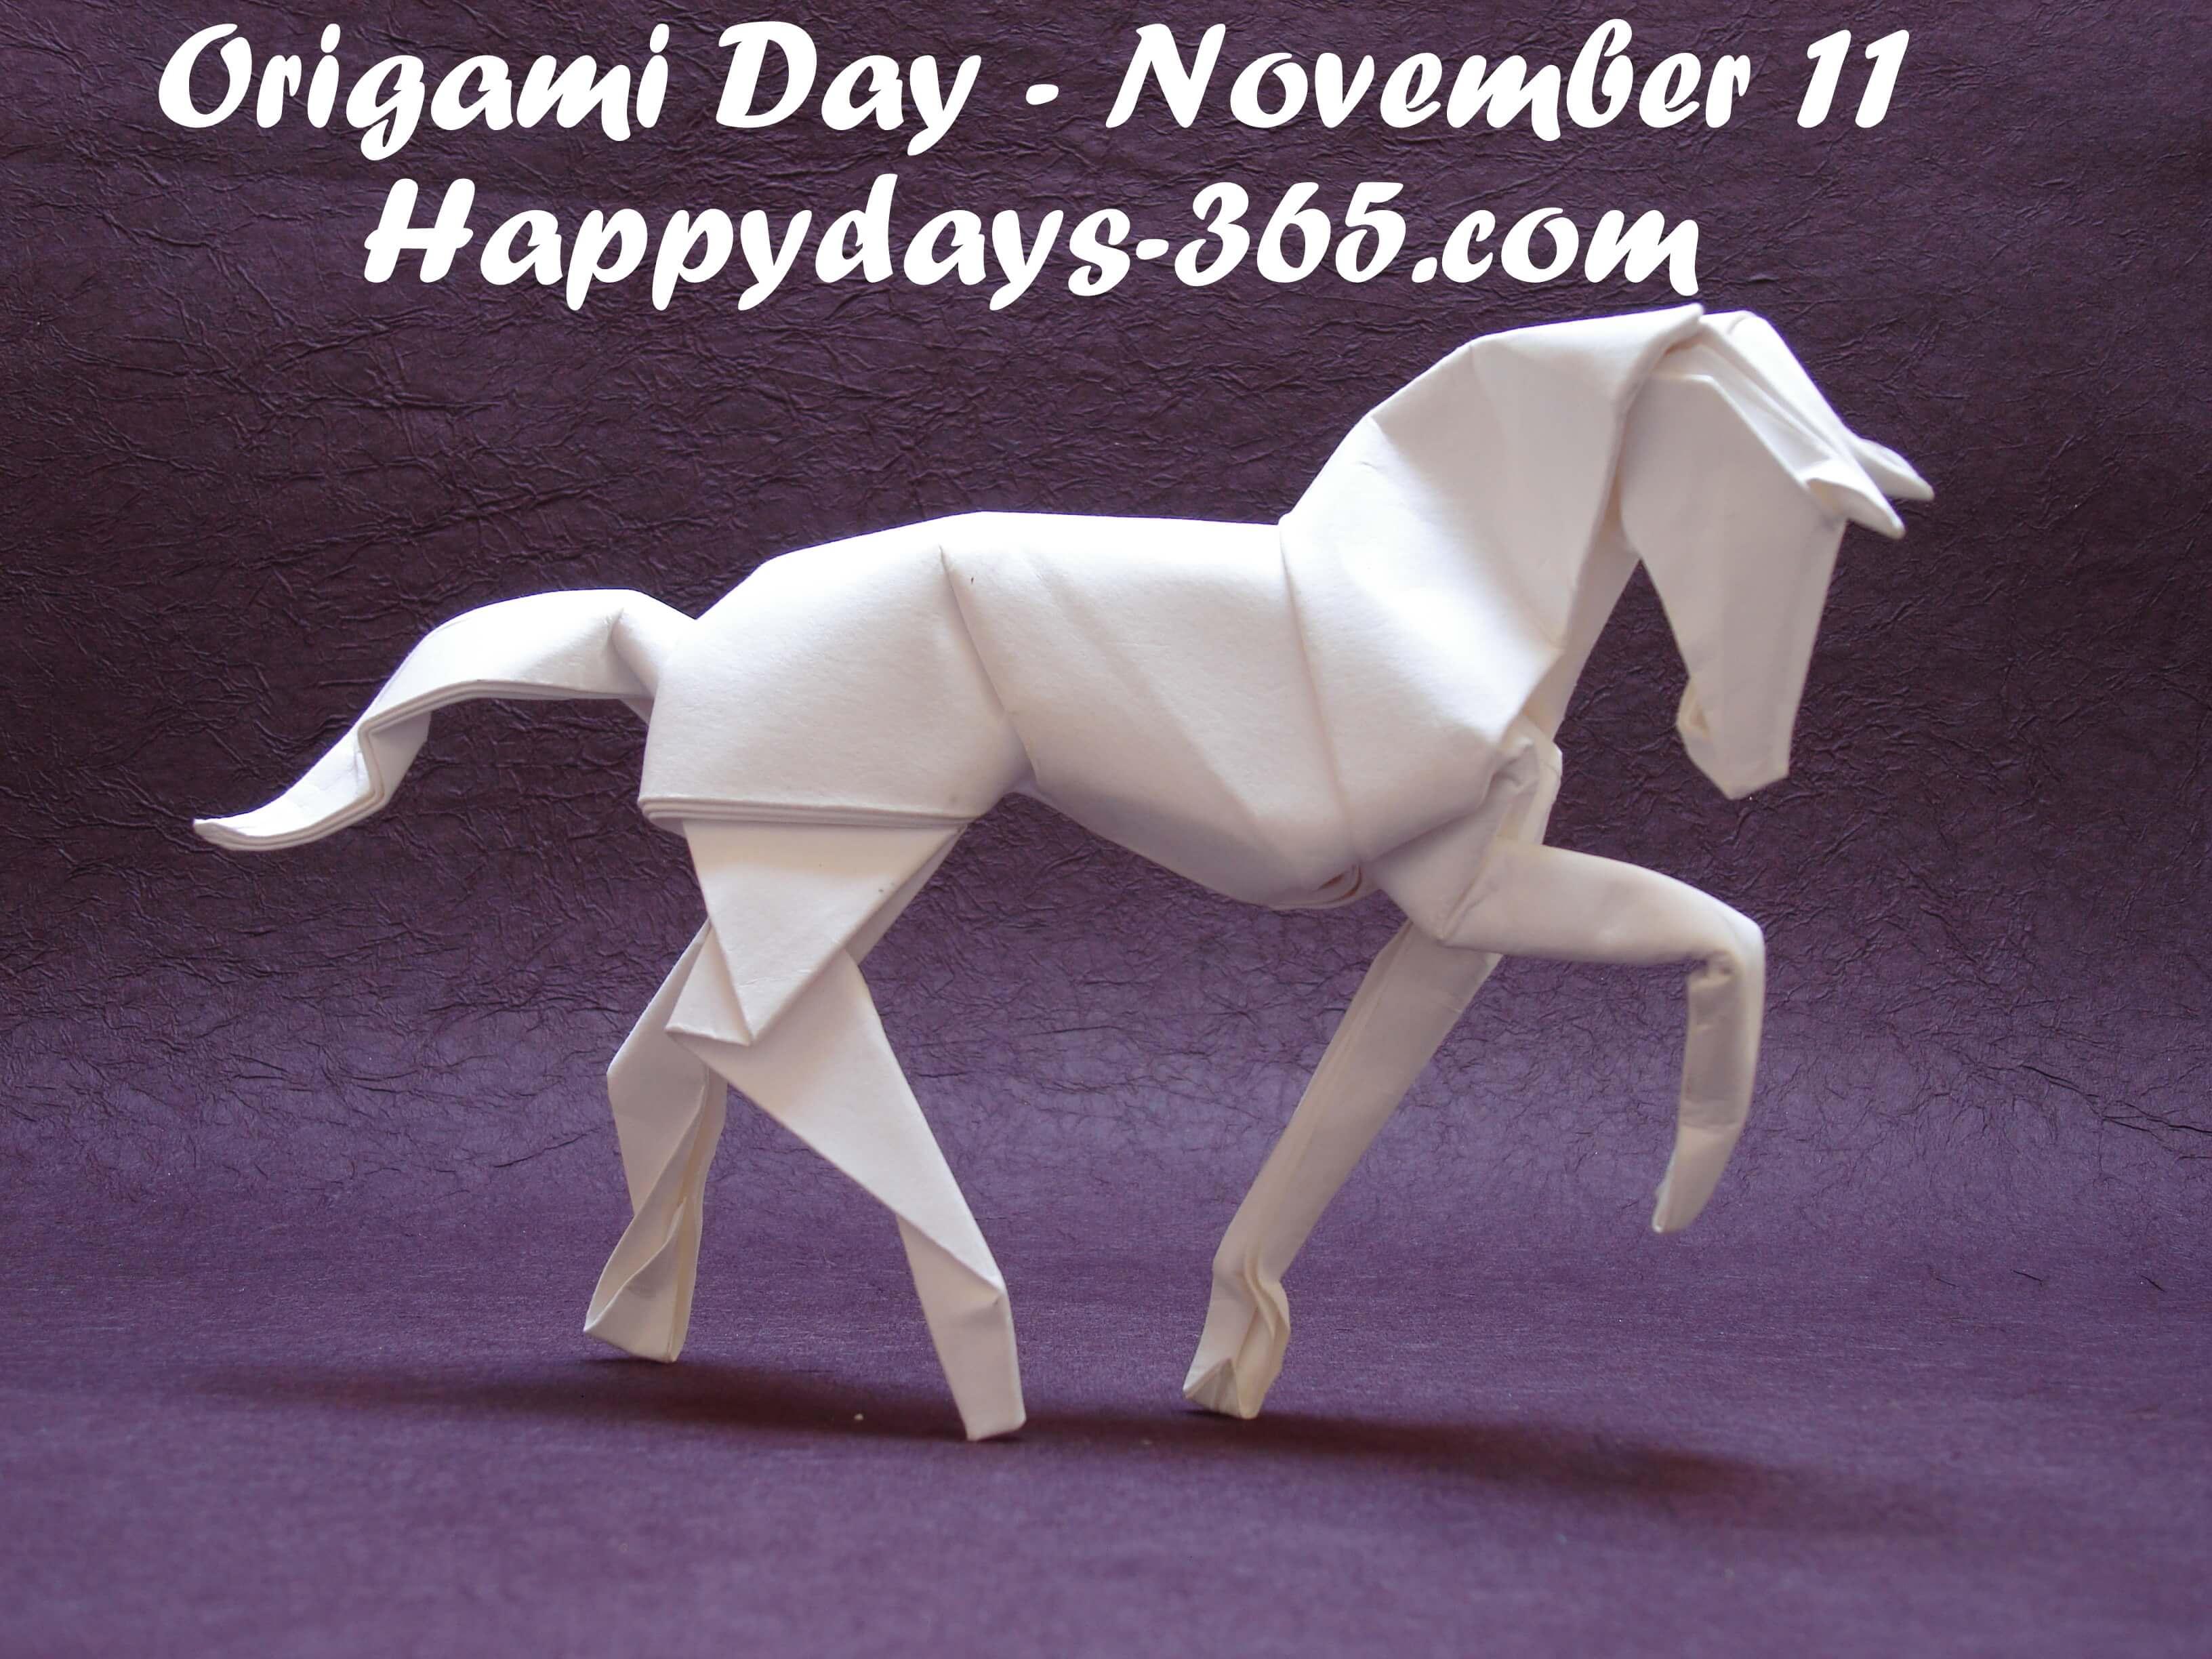 World Origami Day – November 11, 2018